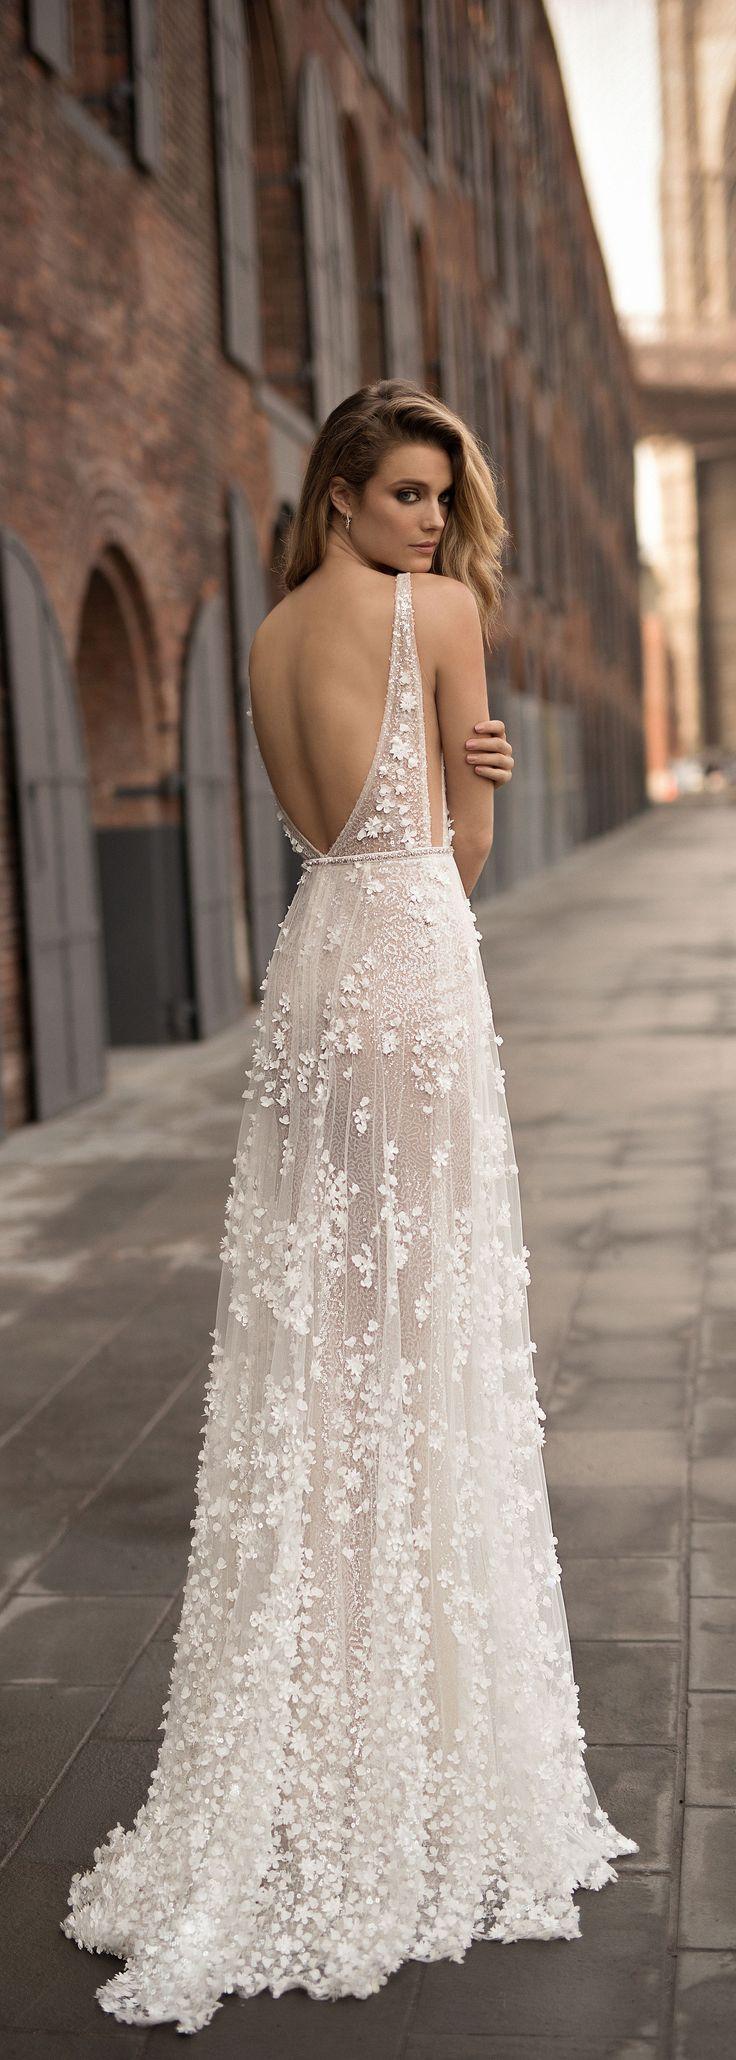 A beautiful, breezy, backless wedding dress by @bertabridal